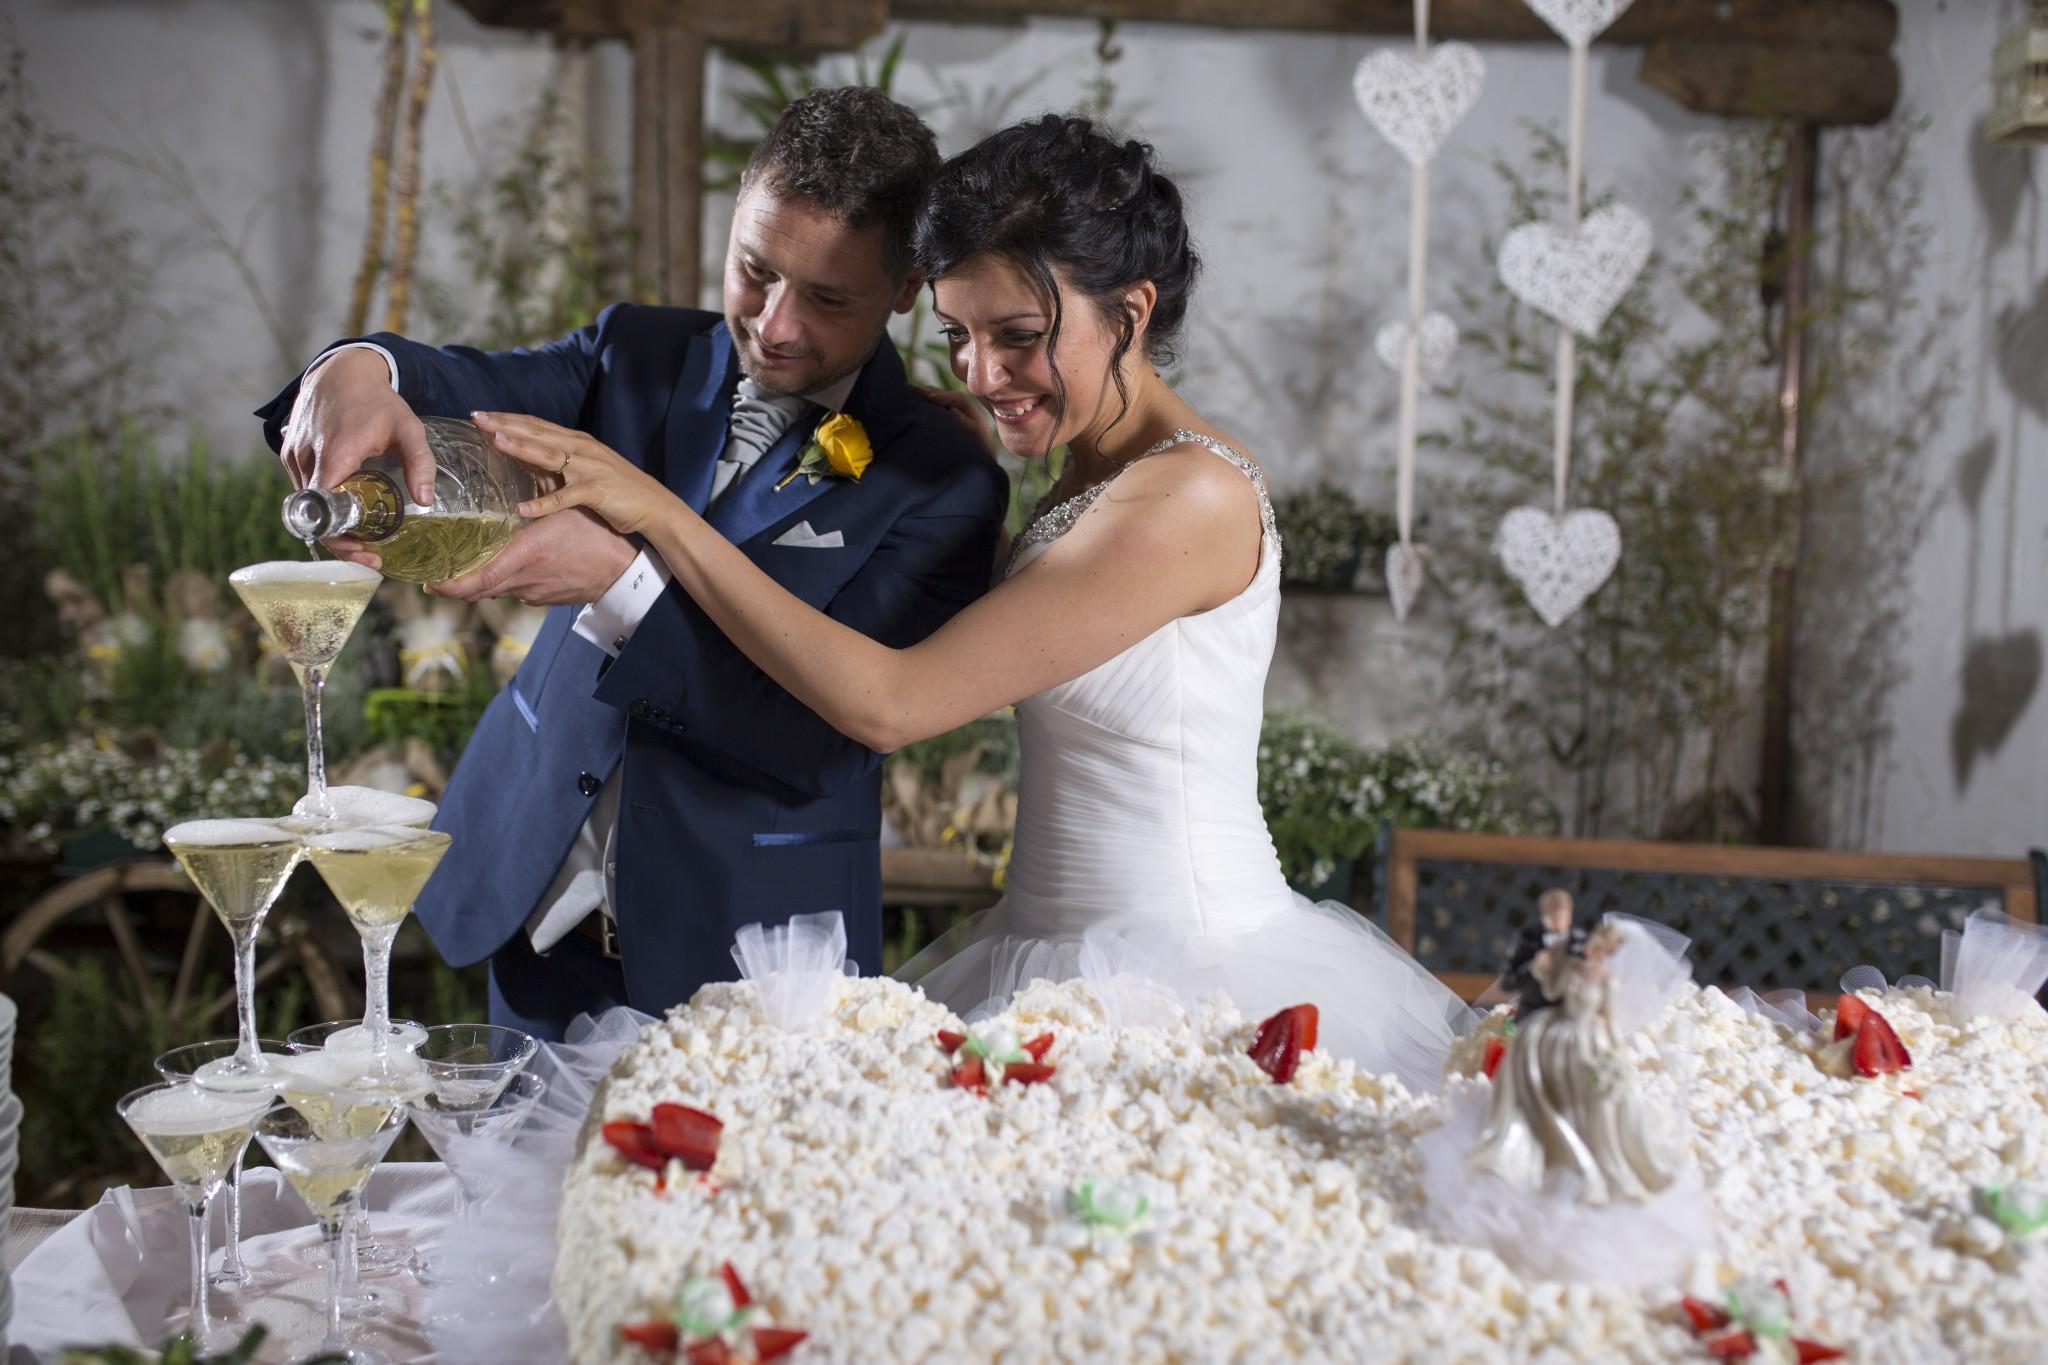 Matrimonio Treviso | Andrea prestana